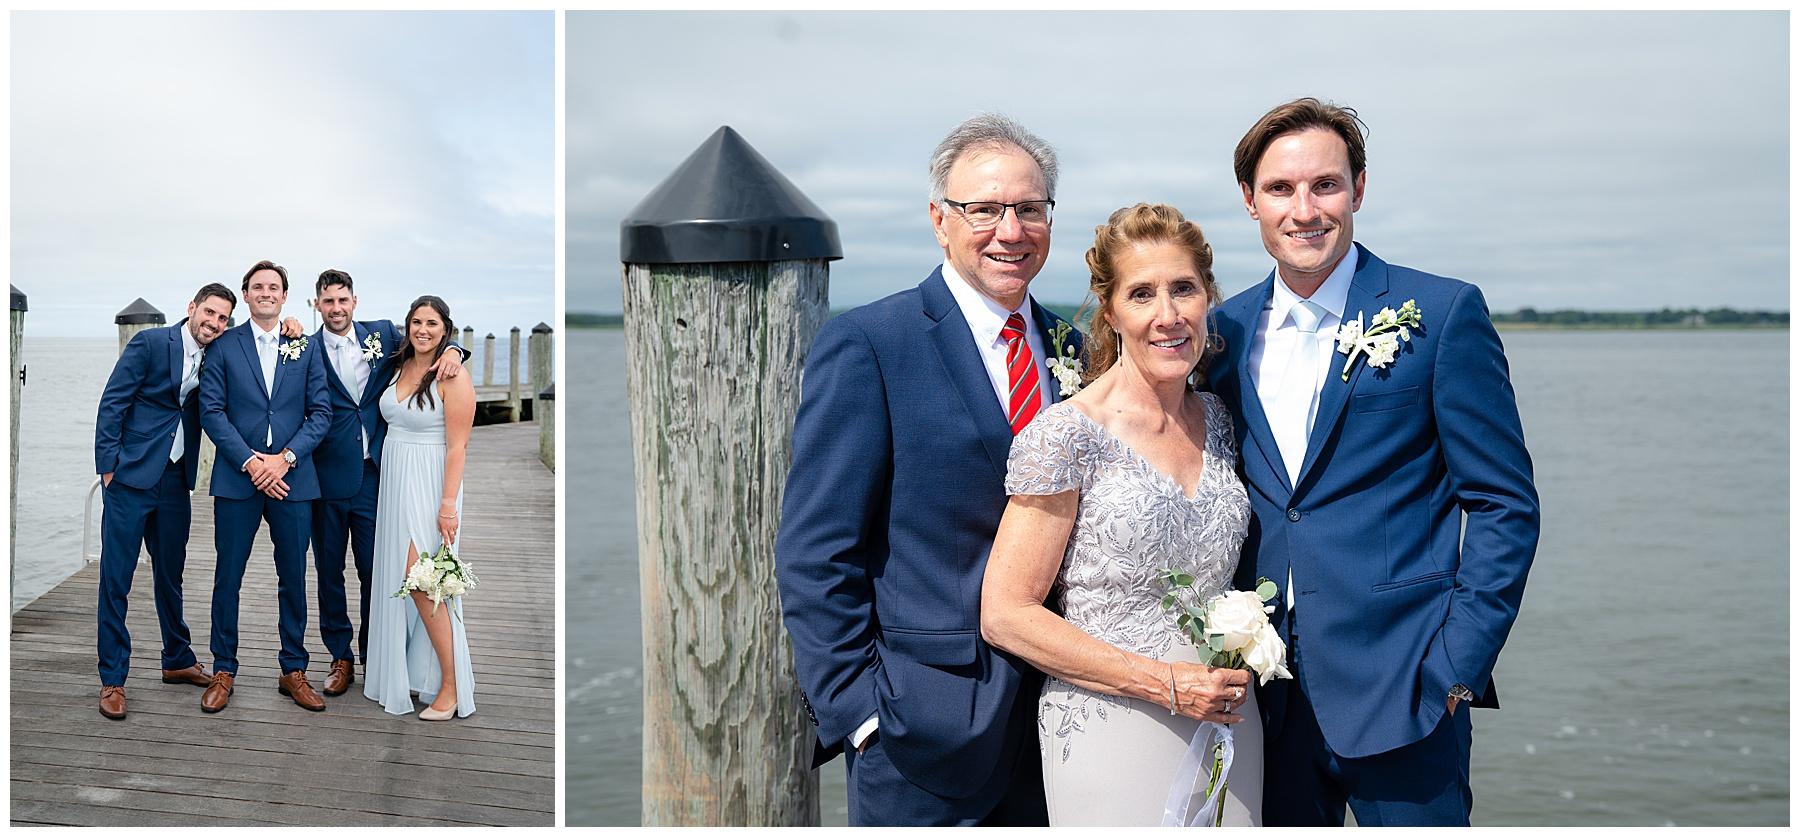 wedding portraits on a dock